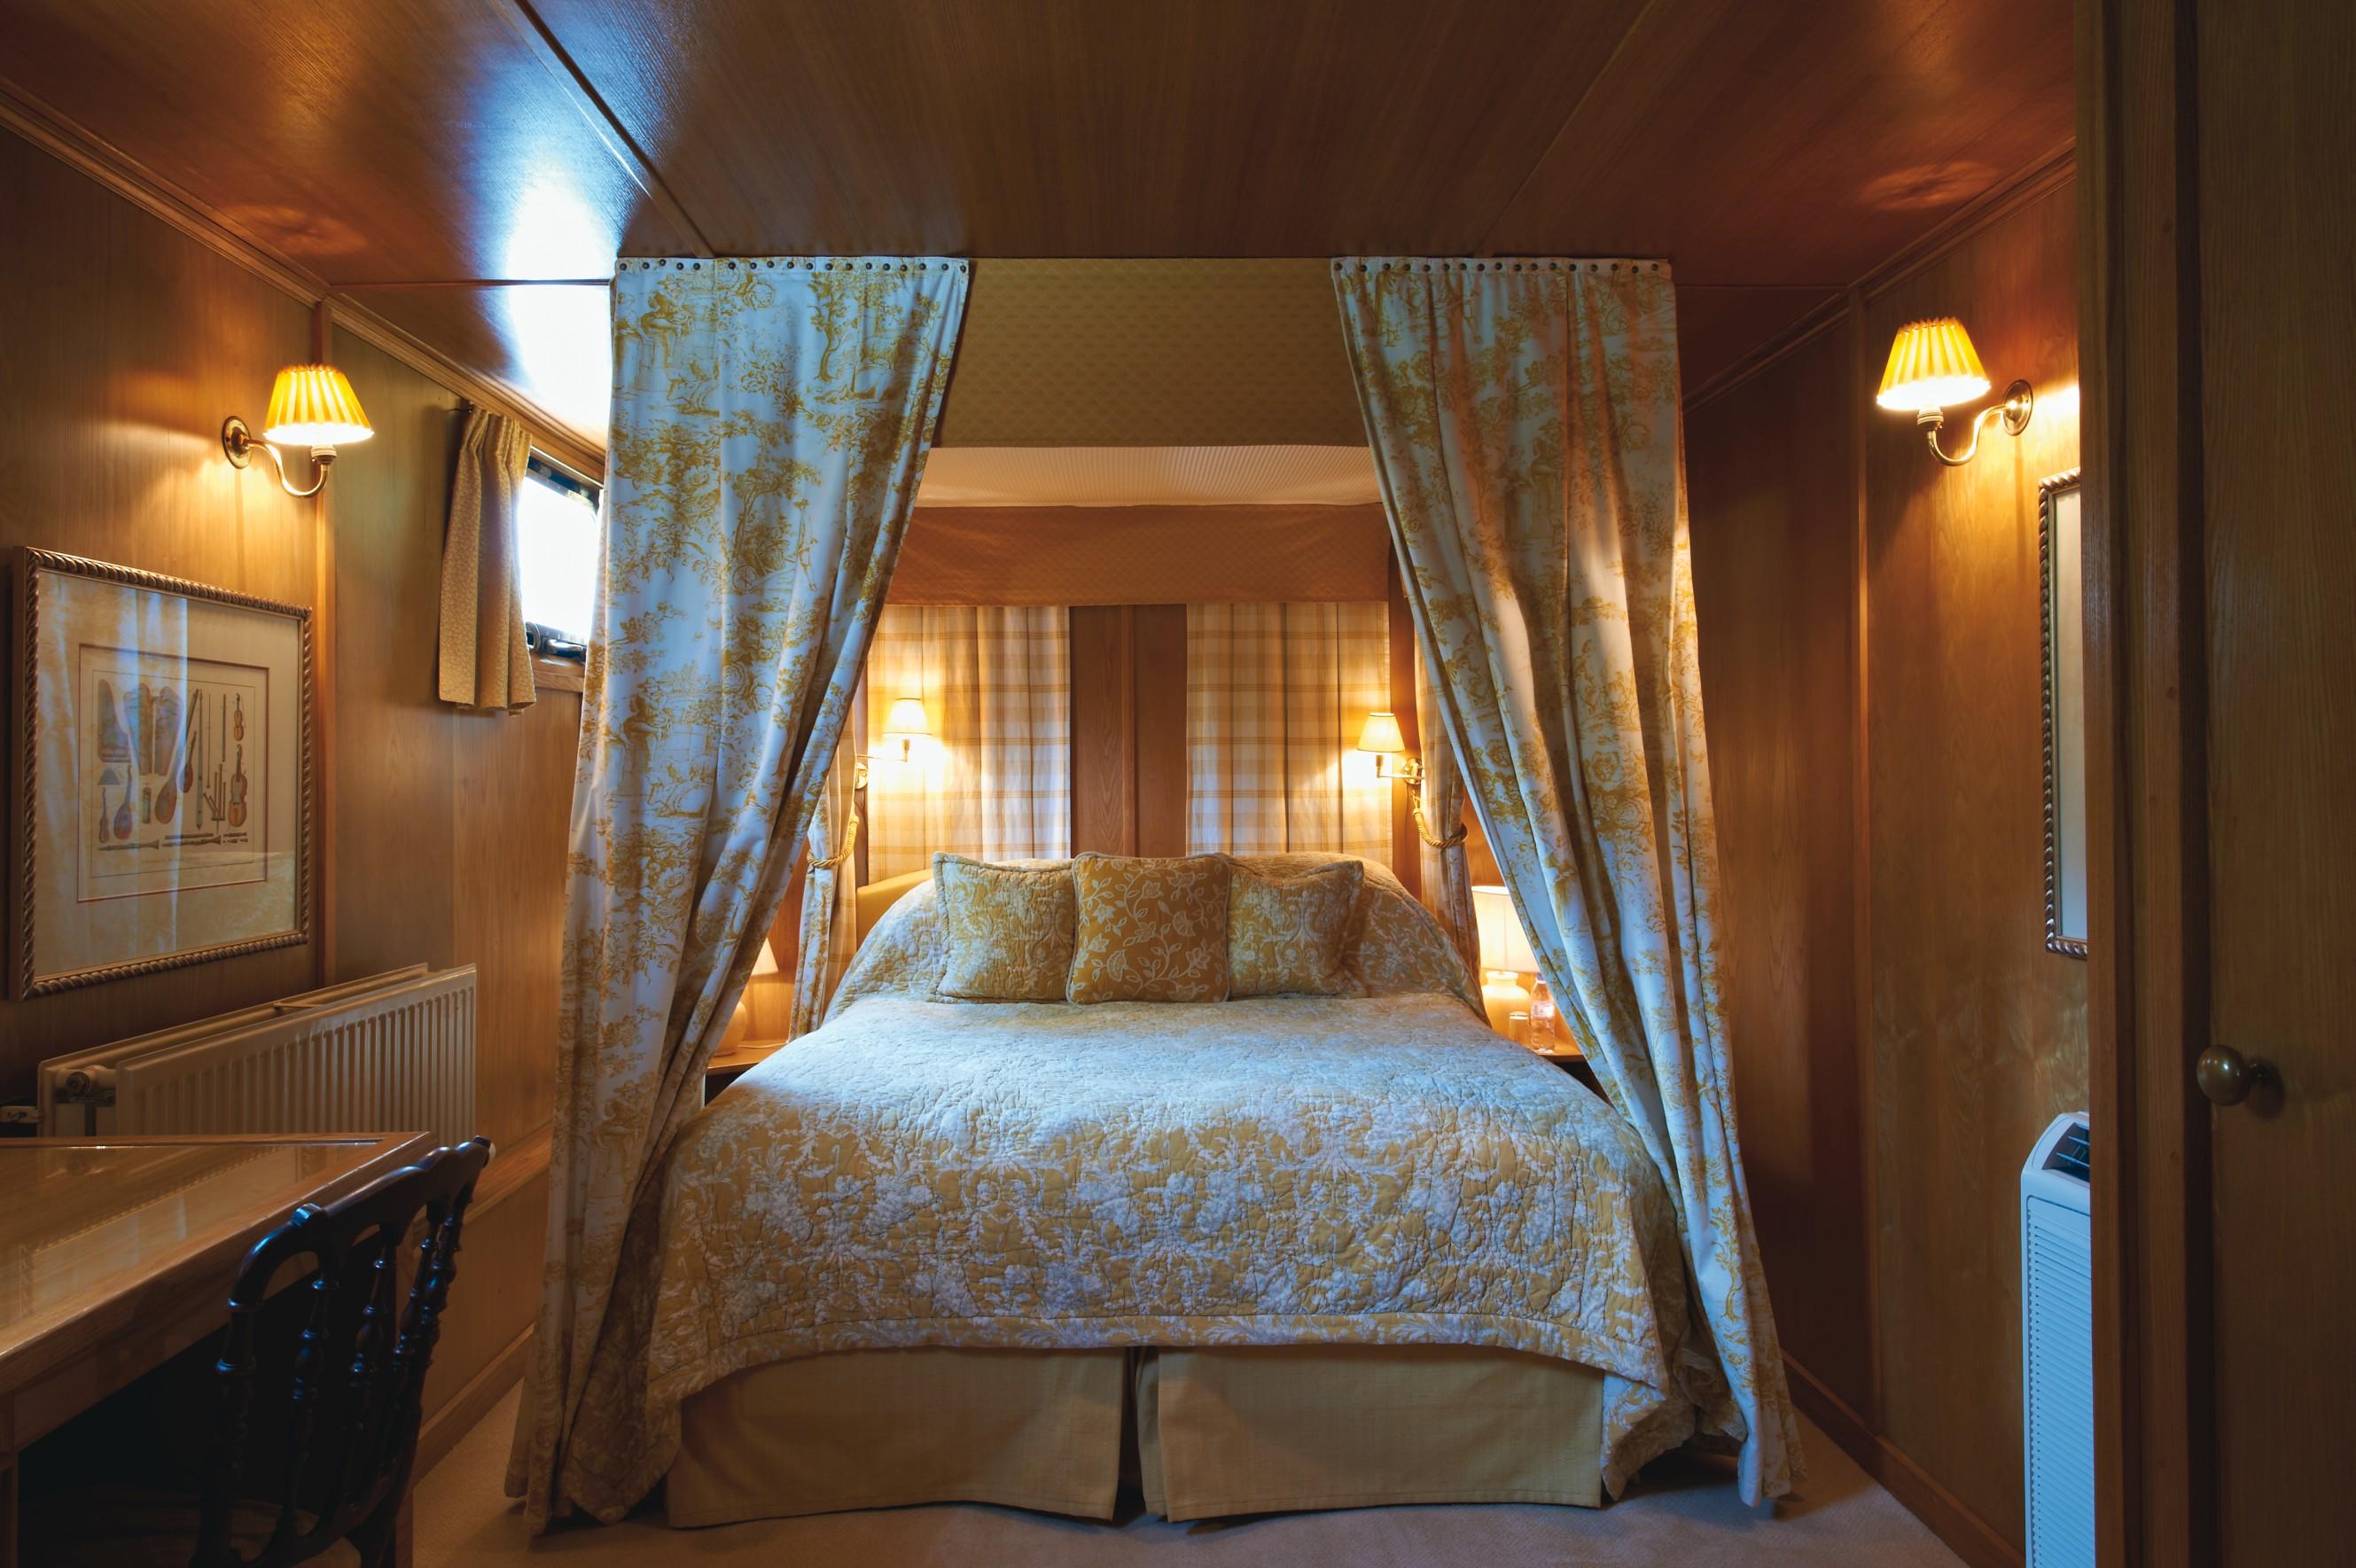 Belmond River Cruises Belmond Fleur de Lys Accommodation Bedroom 1.jpg